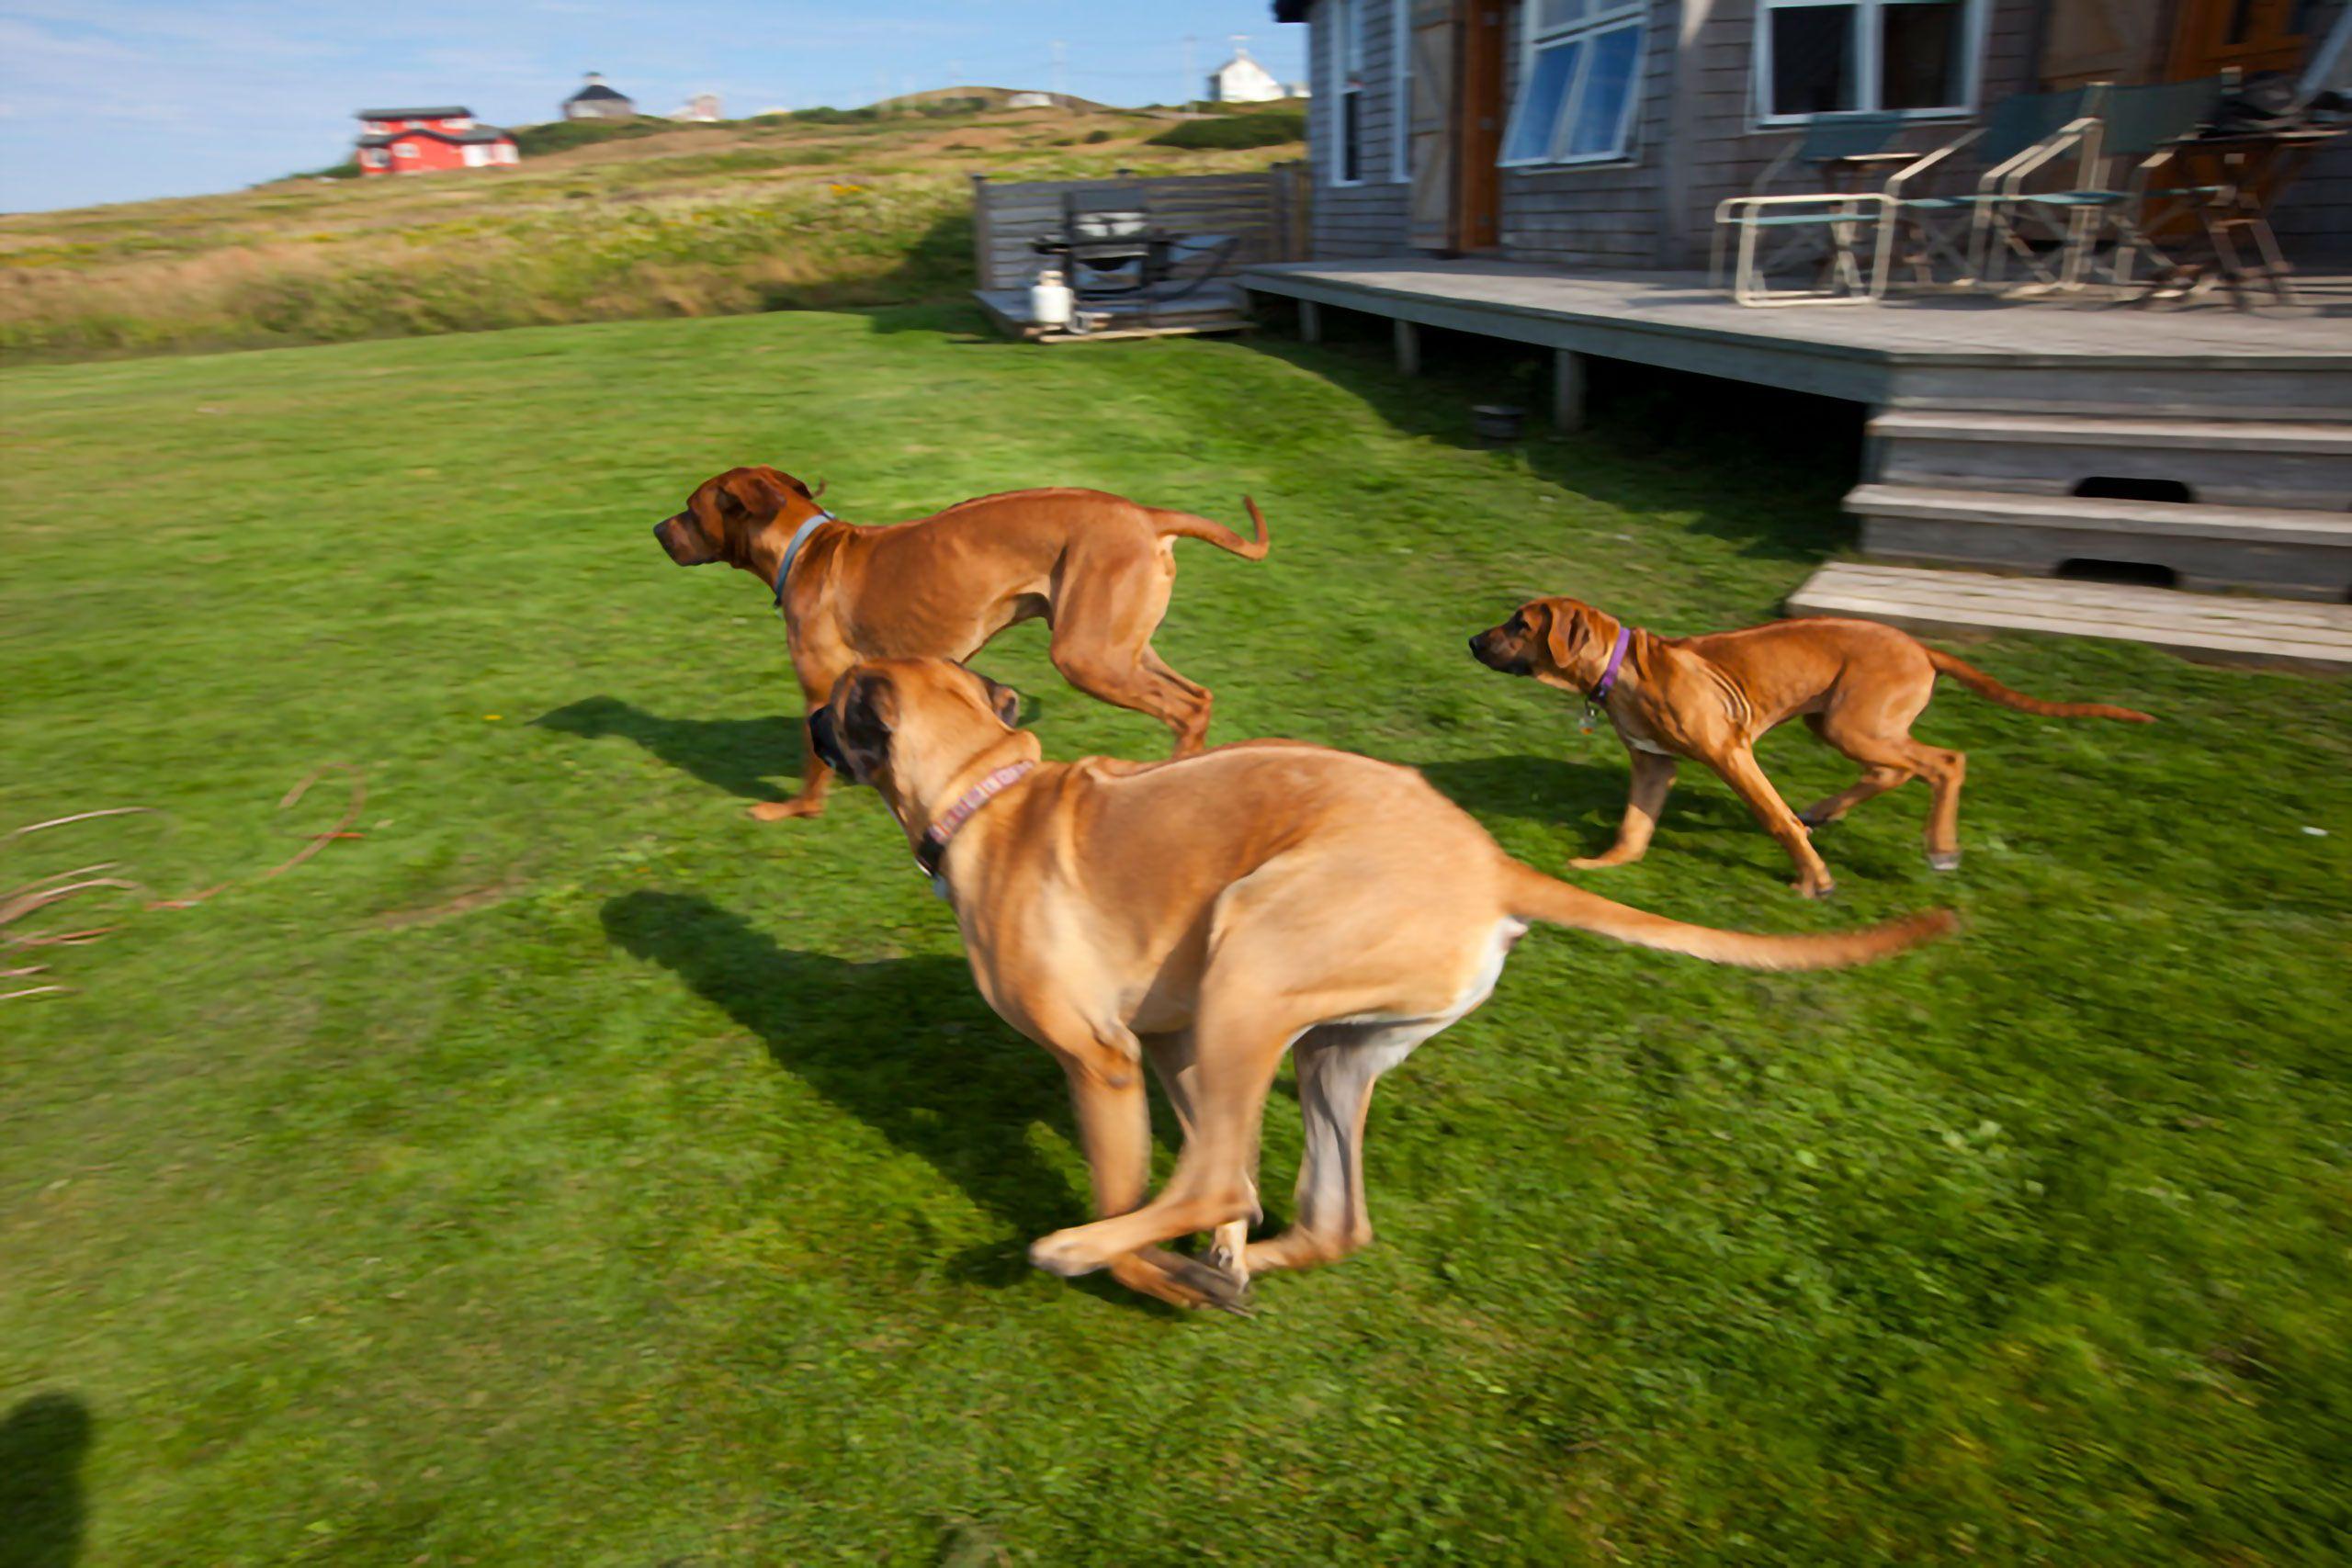 Rhodesian Ridgeback puppy and dogs Magdalen Islands Îles de la Madeleine Harve Aubert Quebec Canada